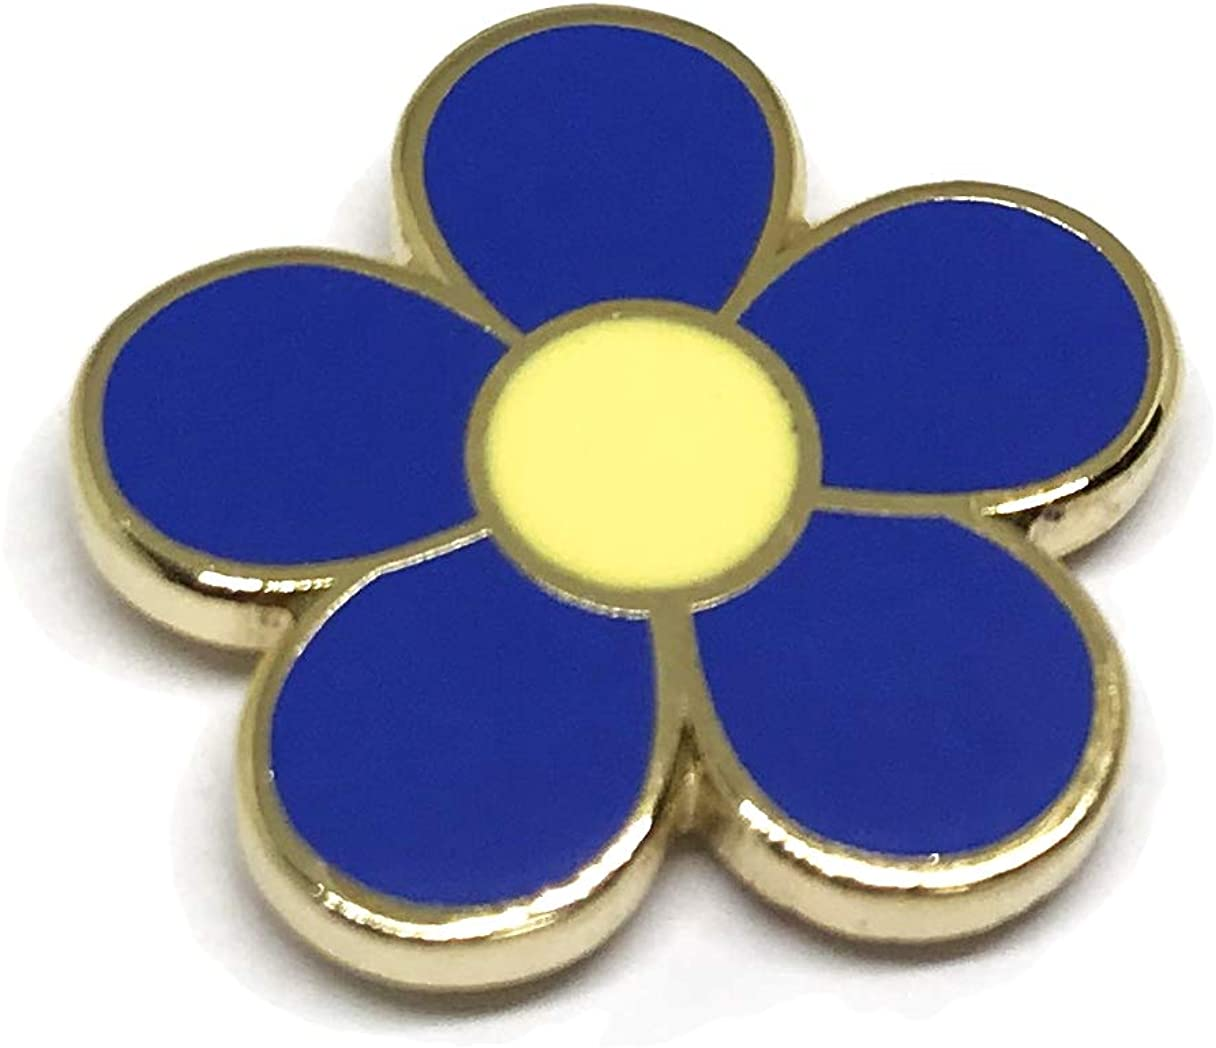 Forget Me Not Lapel Pin - Masonic Pride Brooch - Blue Flower Freemasonic